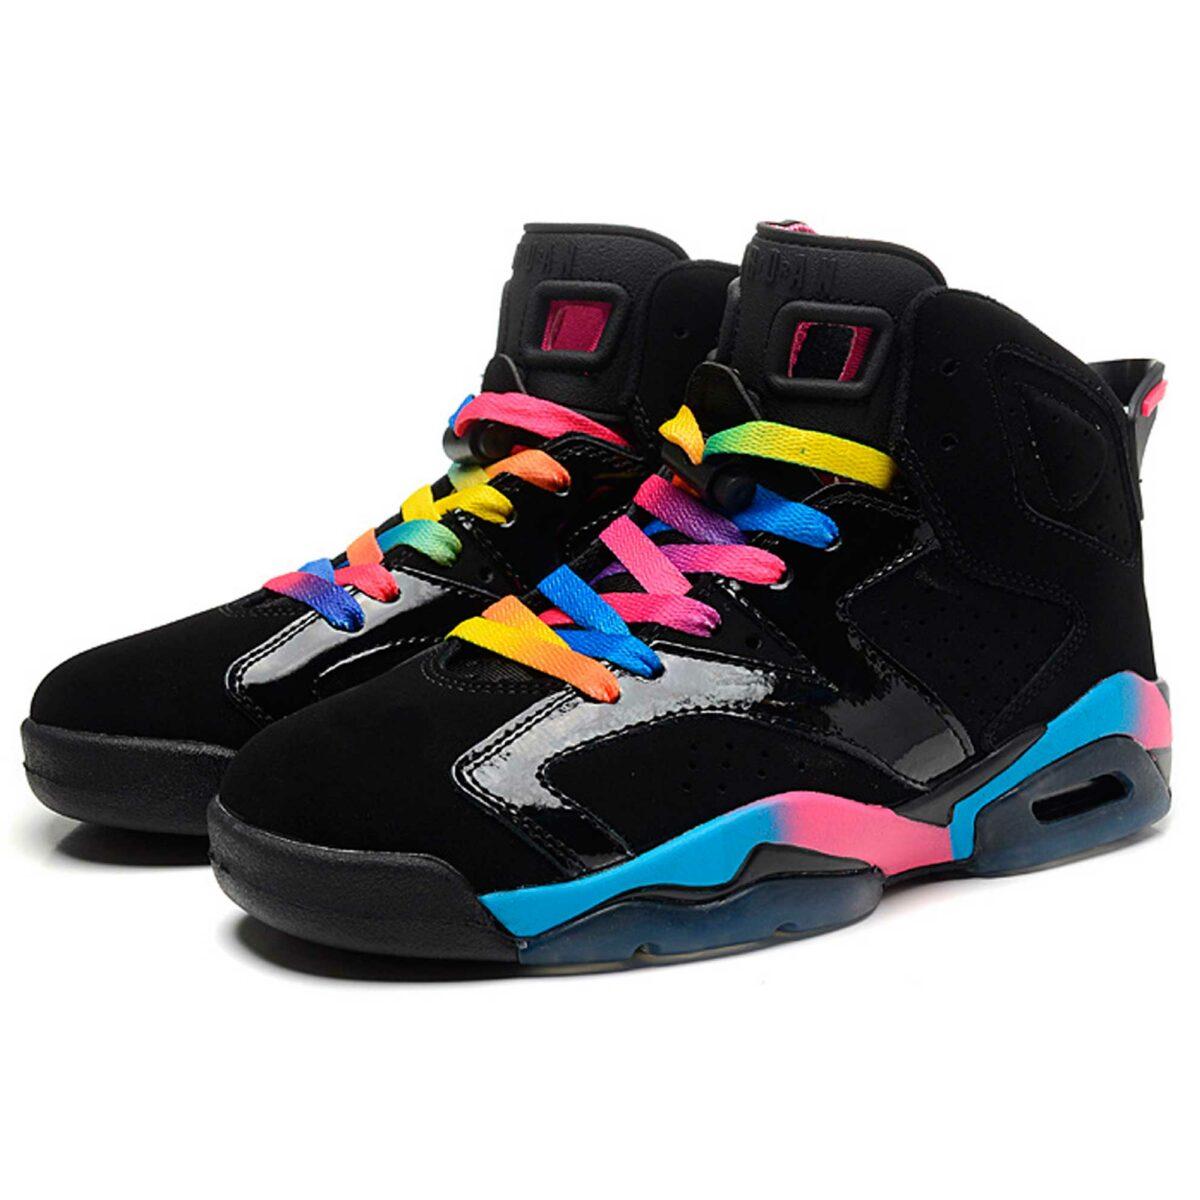 nike air jordan retro 6 GS black pink flash marina blue 543390-050 купить